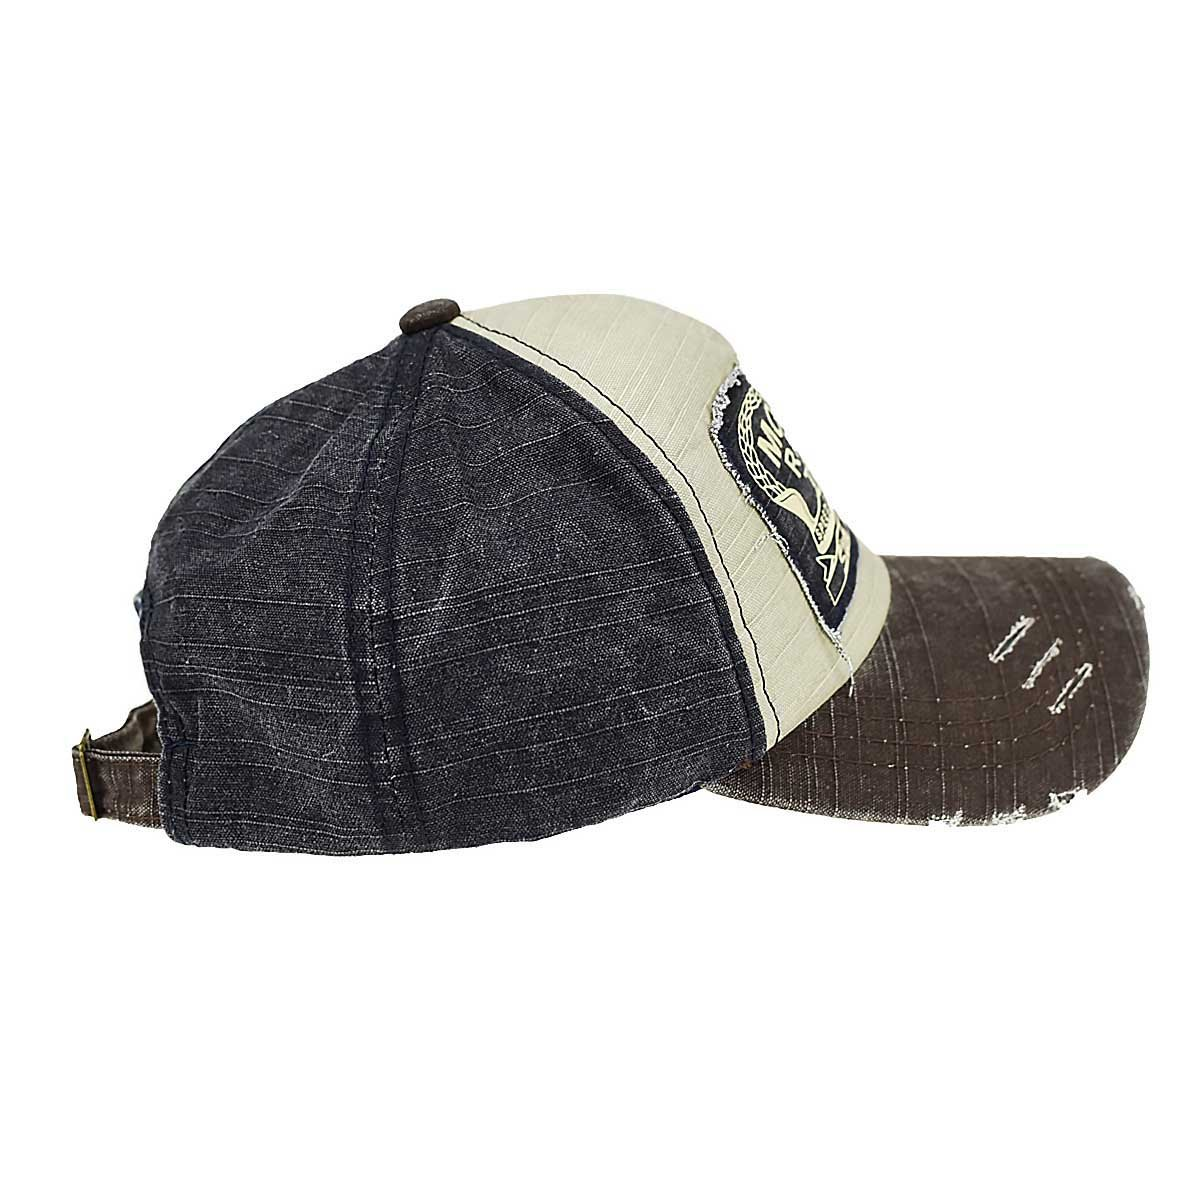 5116ccd4518 Yusongirl Vintage Washed Denim Baseball Cap Classic Cotton Dad Hat  Adjustable Plain Unisex(Coffee) at Amazon Men s Clothing store